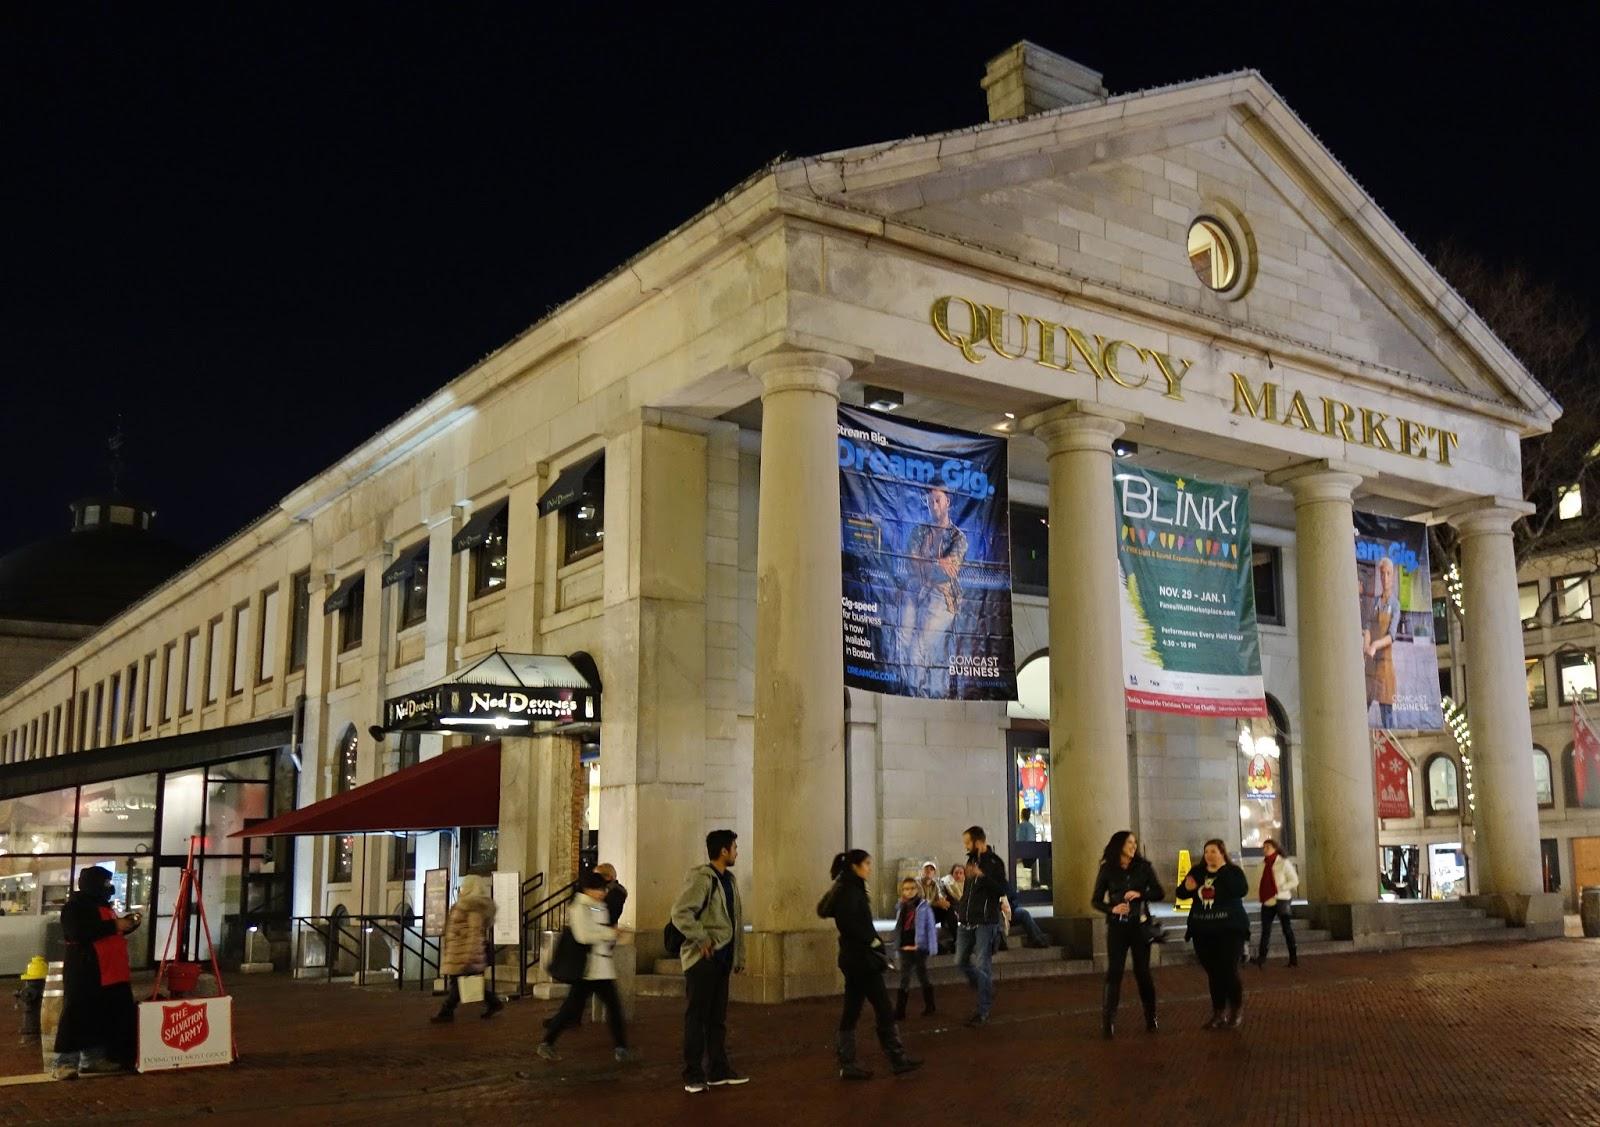 Joe S Retirement Blog Quincy Market Boston